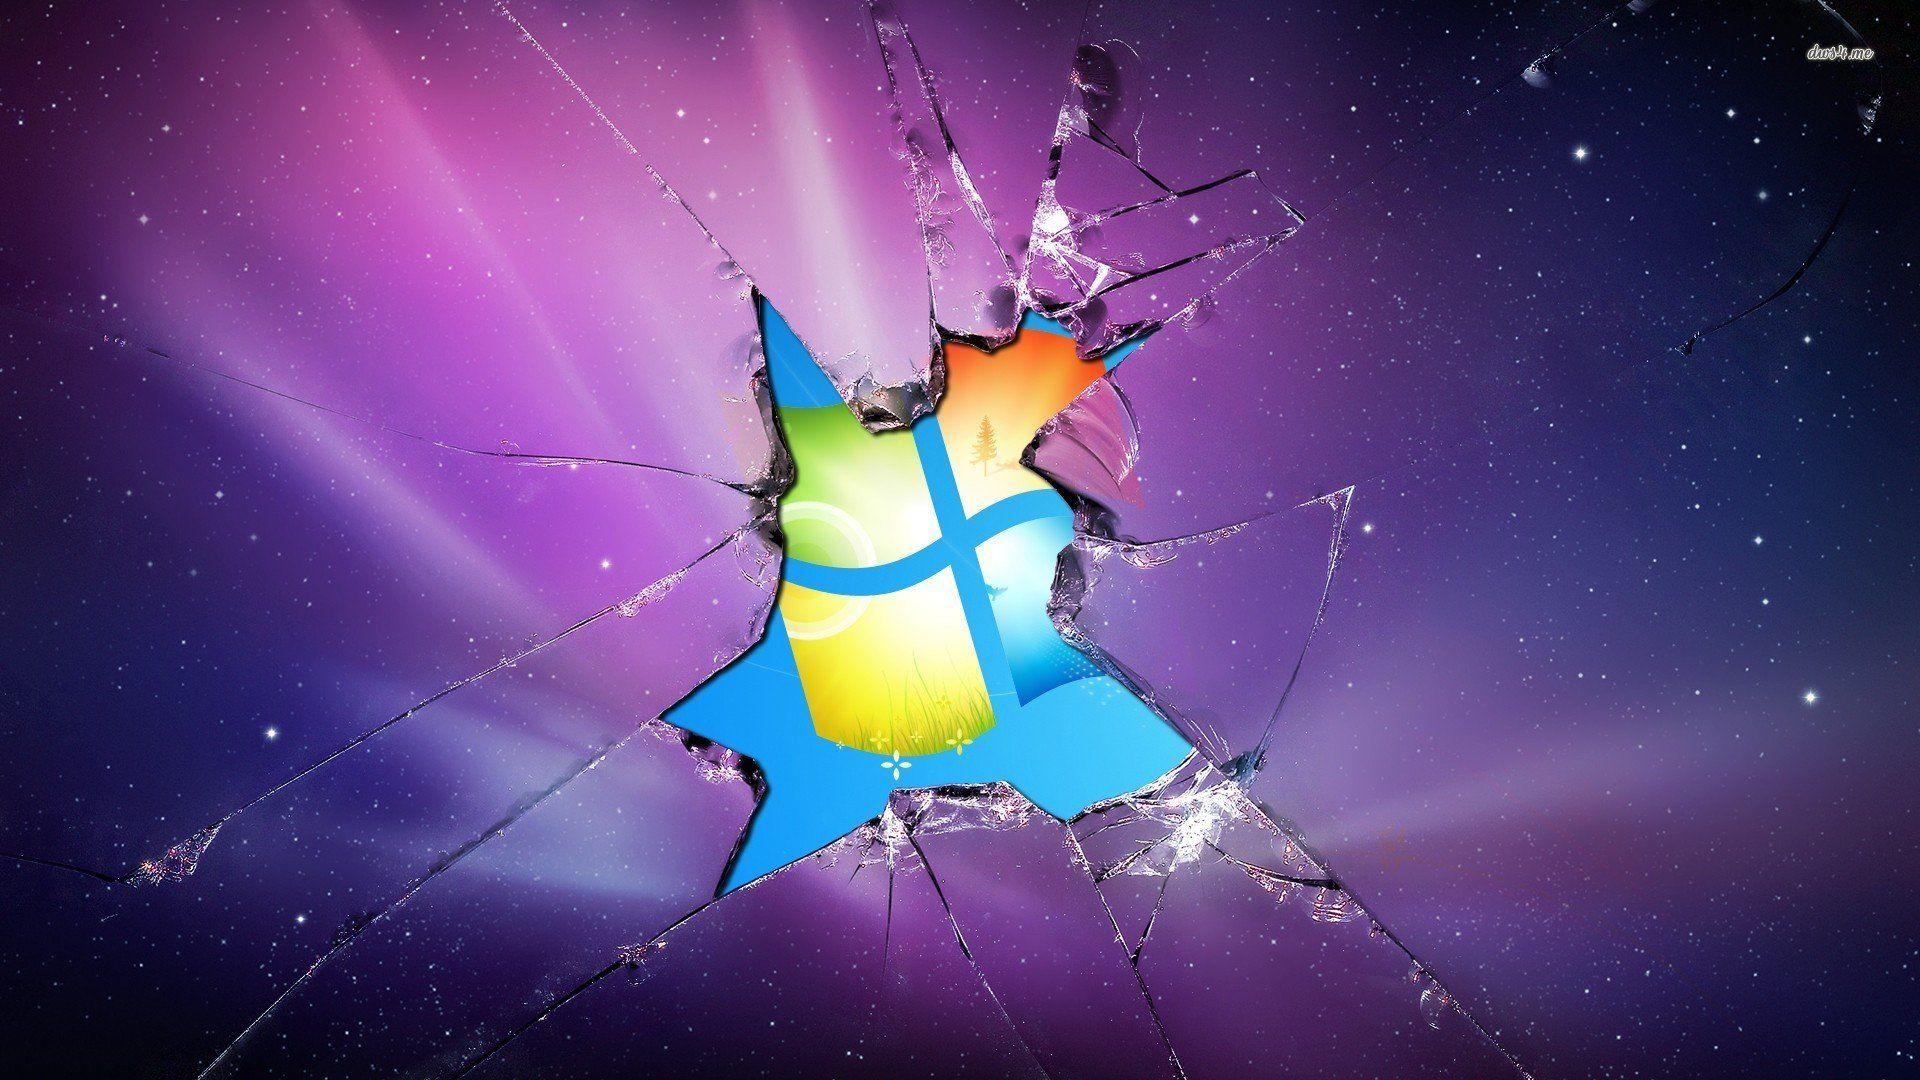 Cracked Screen Wallpaper Creeper - Broken Screen Wallpapers Windows 7 - HD Wallpaper